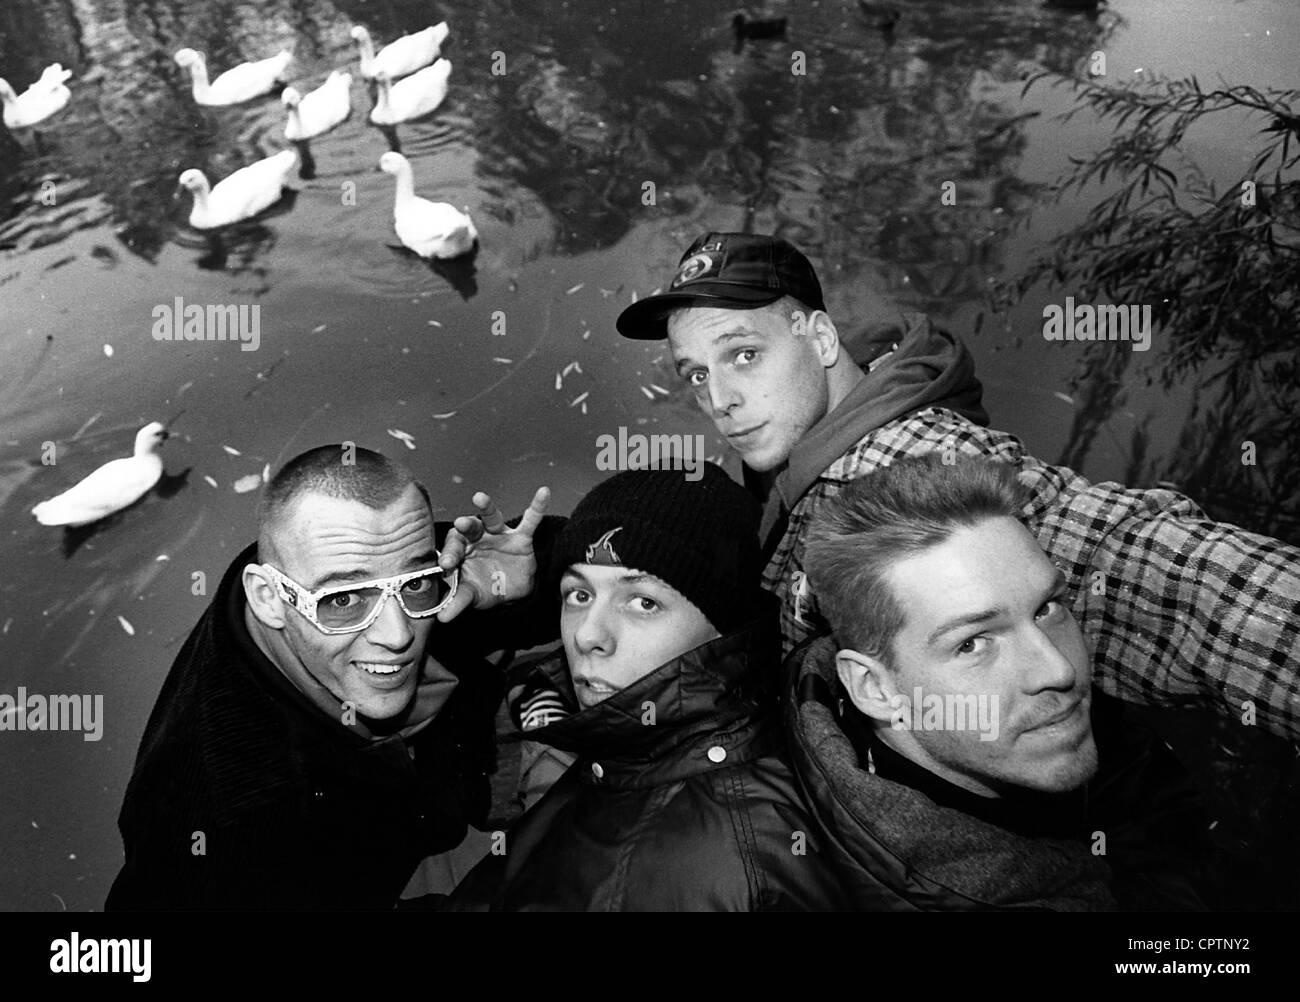 Die Fantastischen Vier, German music group (rap, hip hop), formed in 1986, group picture, 1994, Stock Photo